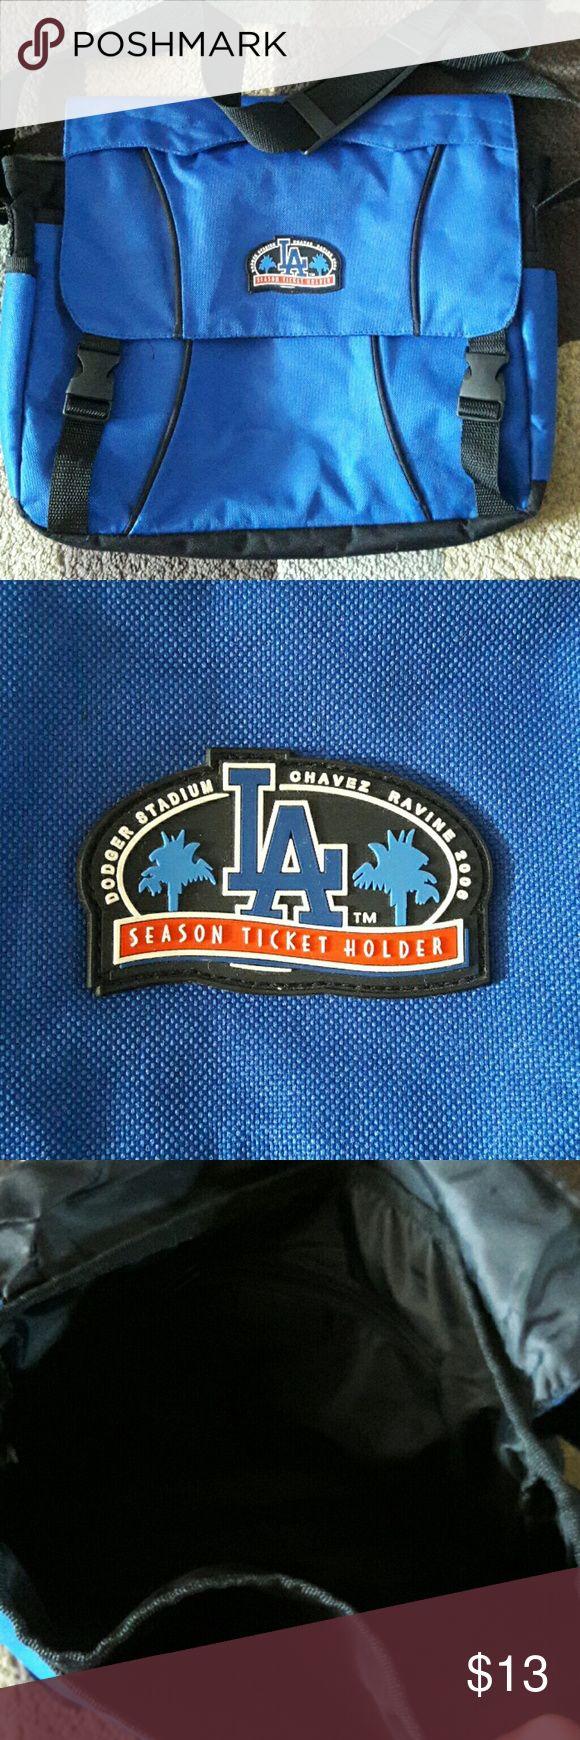 Los Angeles Dodgers messenger bag Los Angeles Dodgers messenger bag. Has zippered pocket inside. This rare bag was a season ticket holder gift. Bags